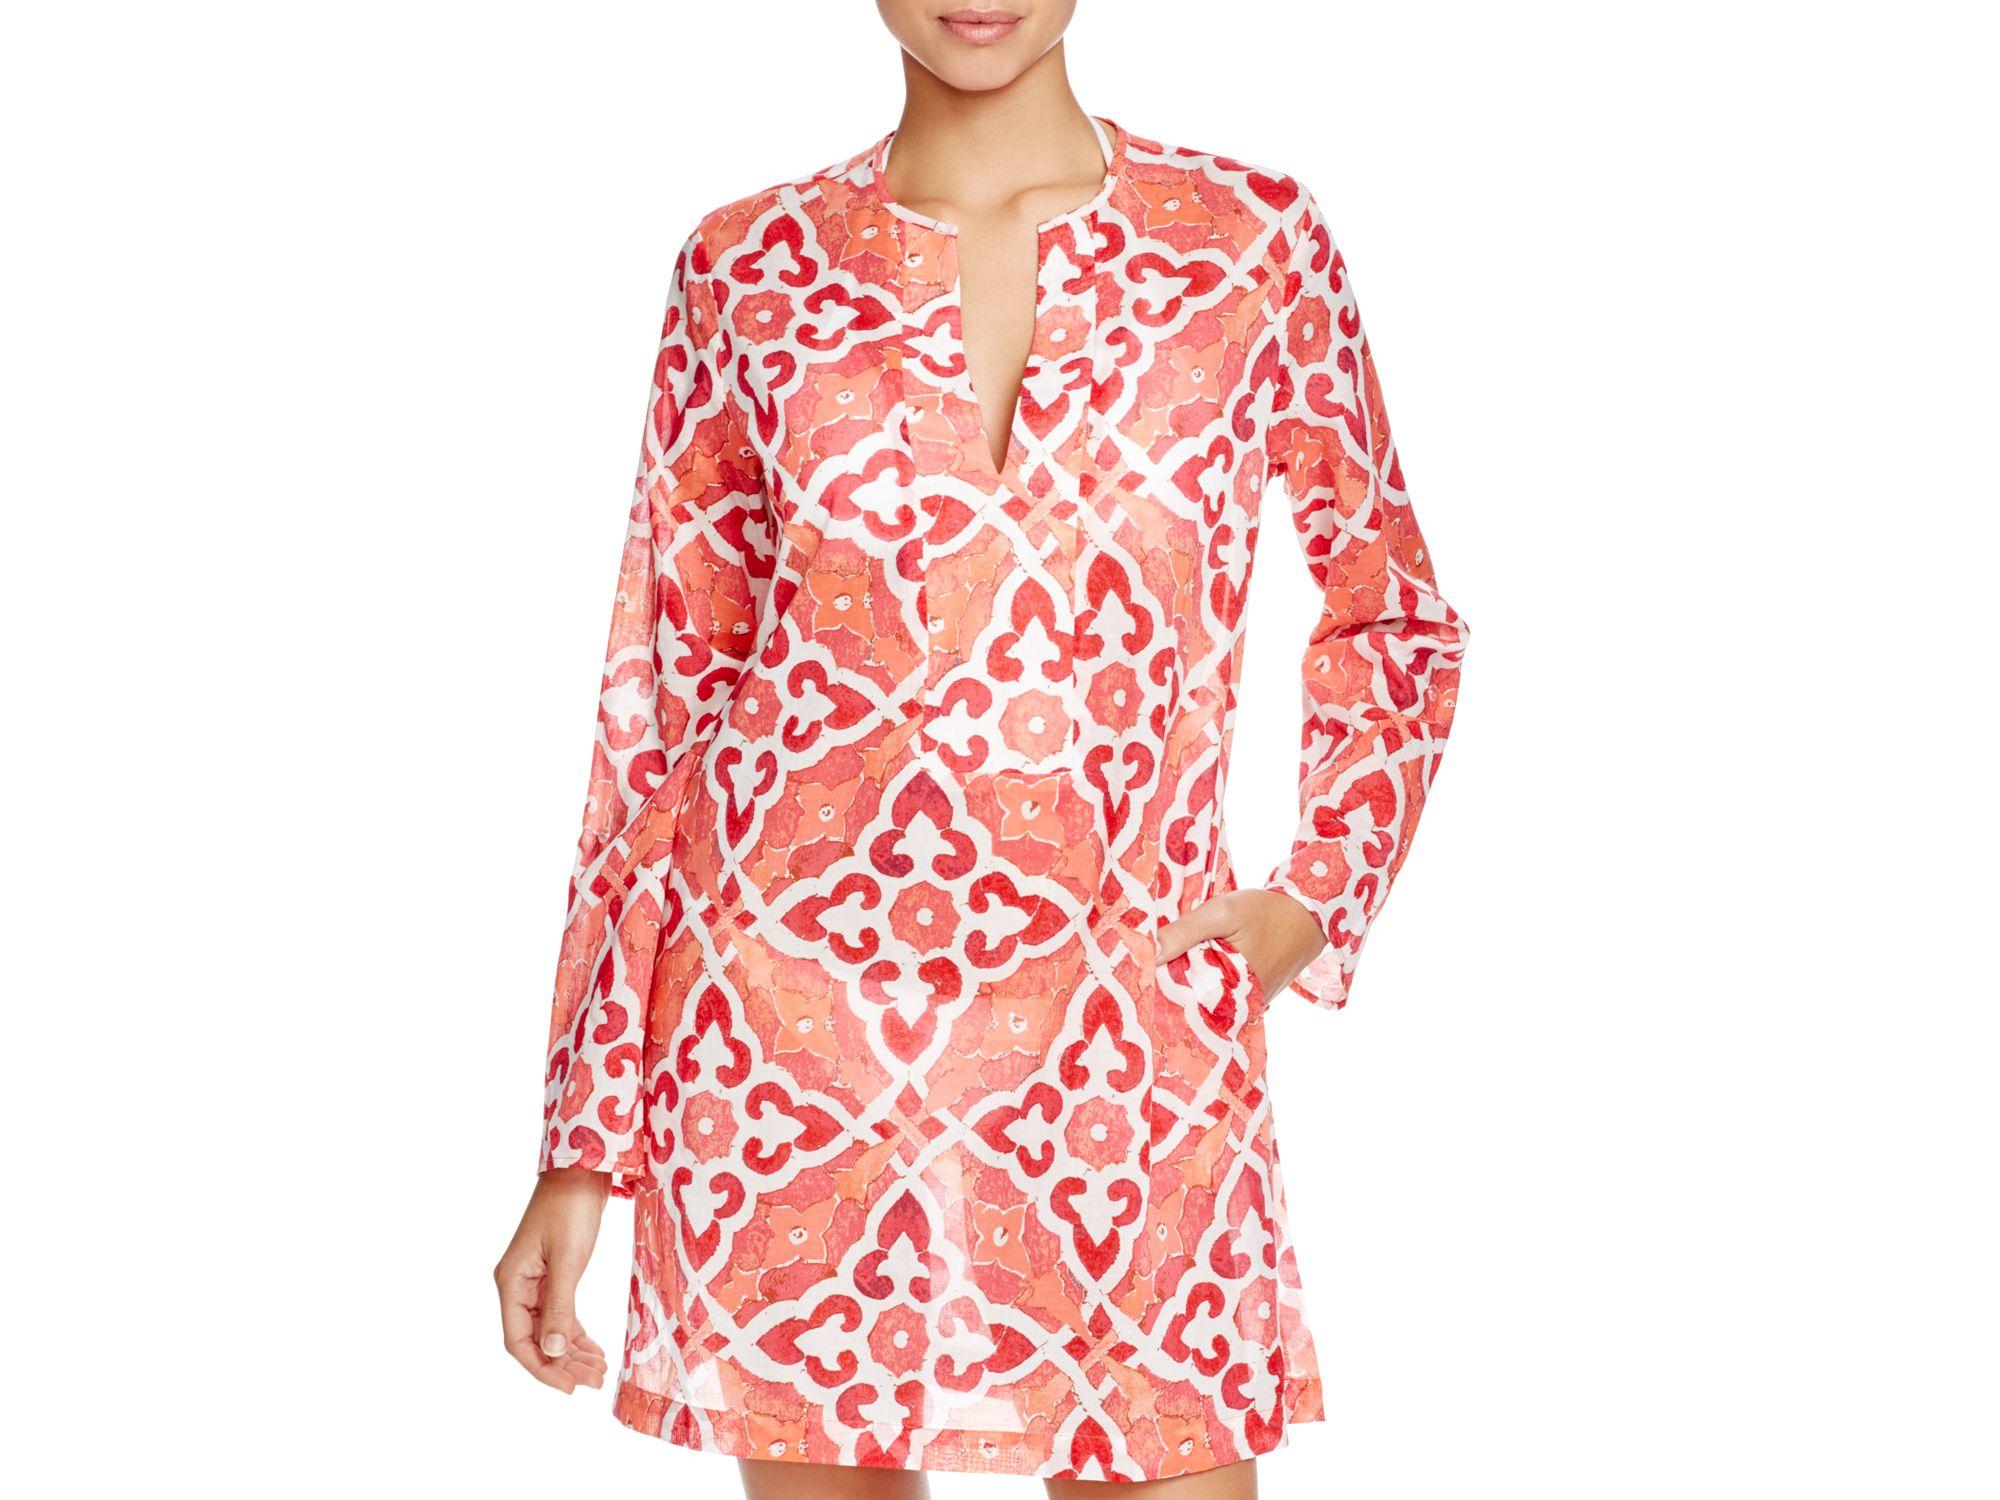 e4d372033048ce echo-fuschia-flower-tropic-medallion-tunic-swim-cover-up-pink-product-0-591985331-normal.jpeg